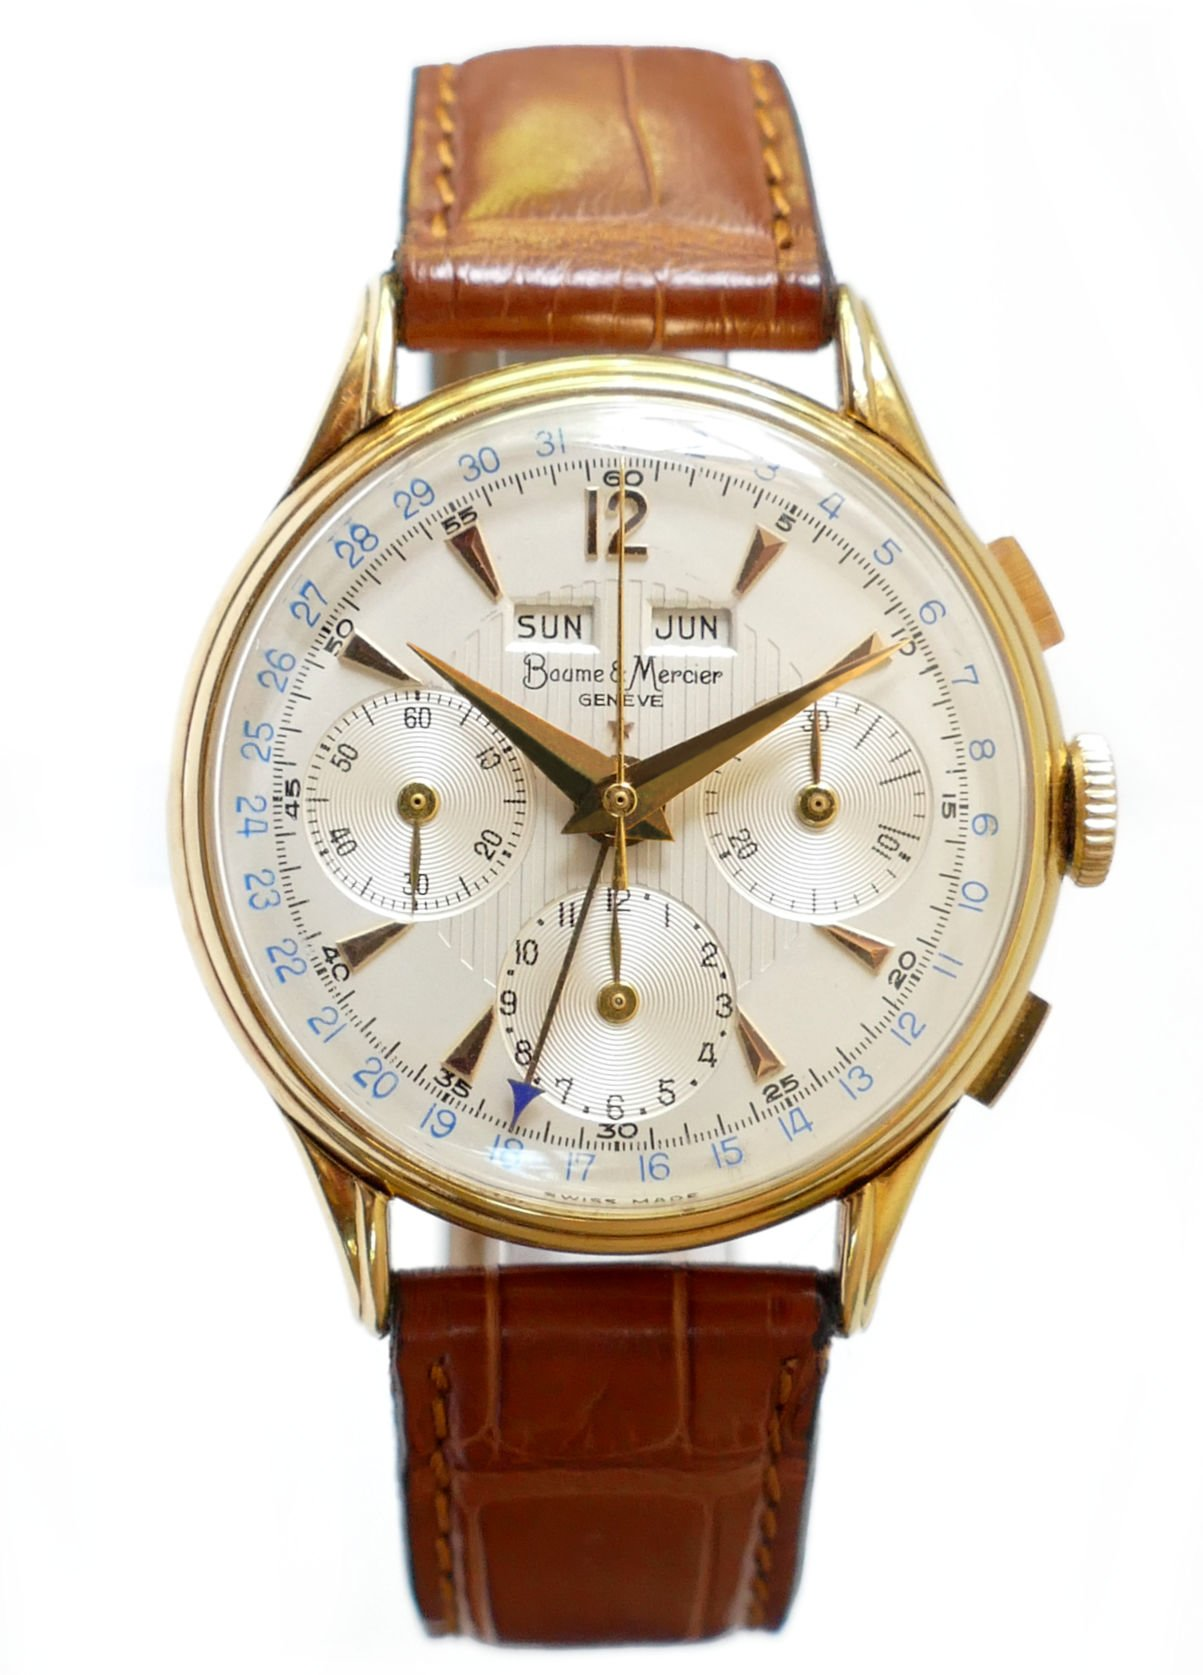 Baume & Mercier Vintage Chronograph